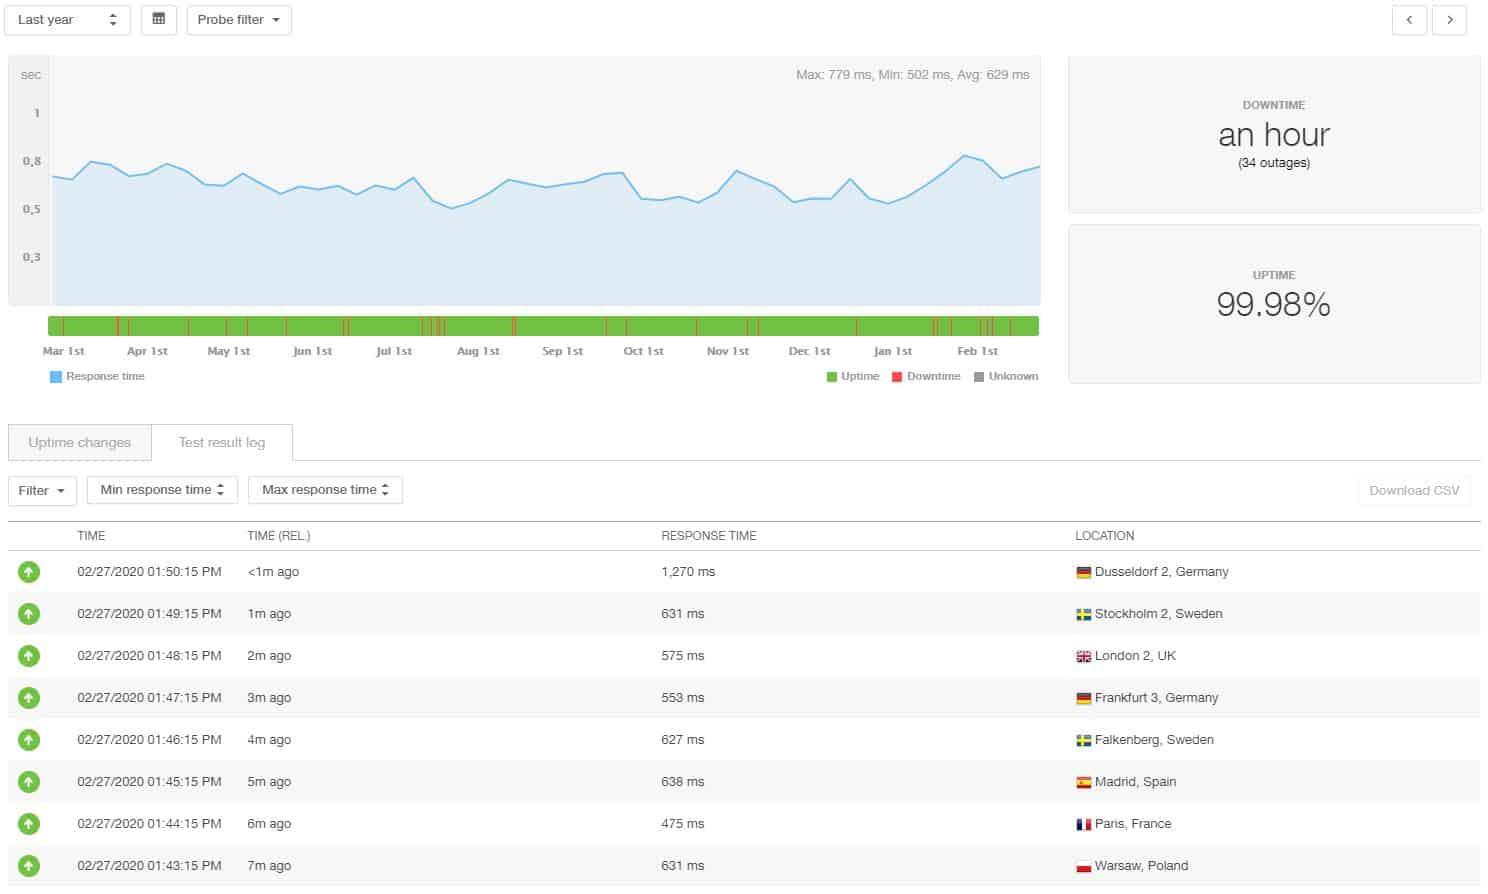 SiteGround 12 month statistics